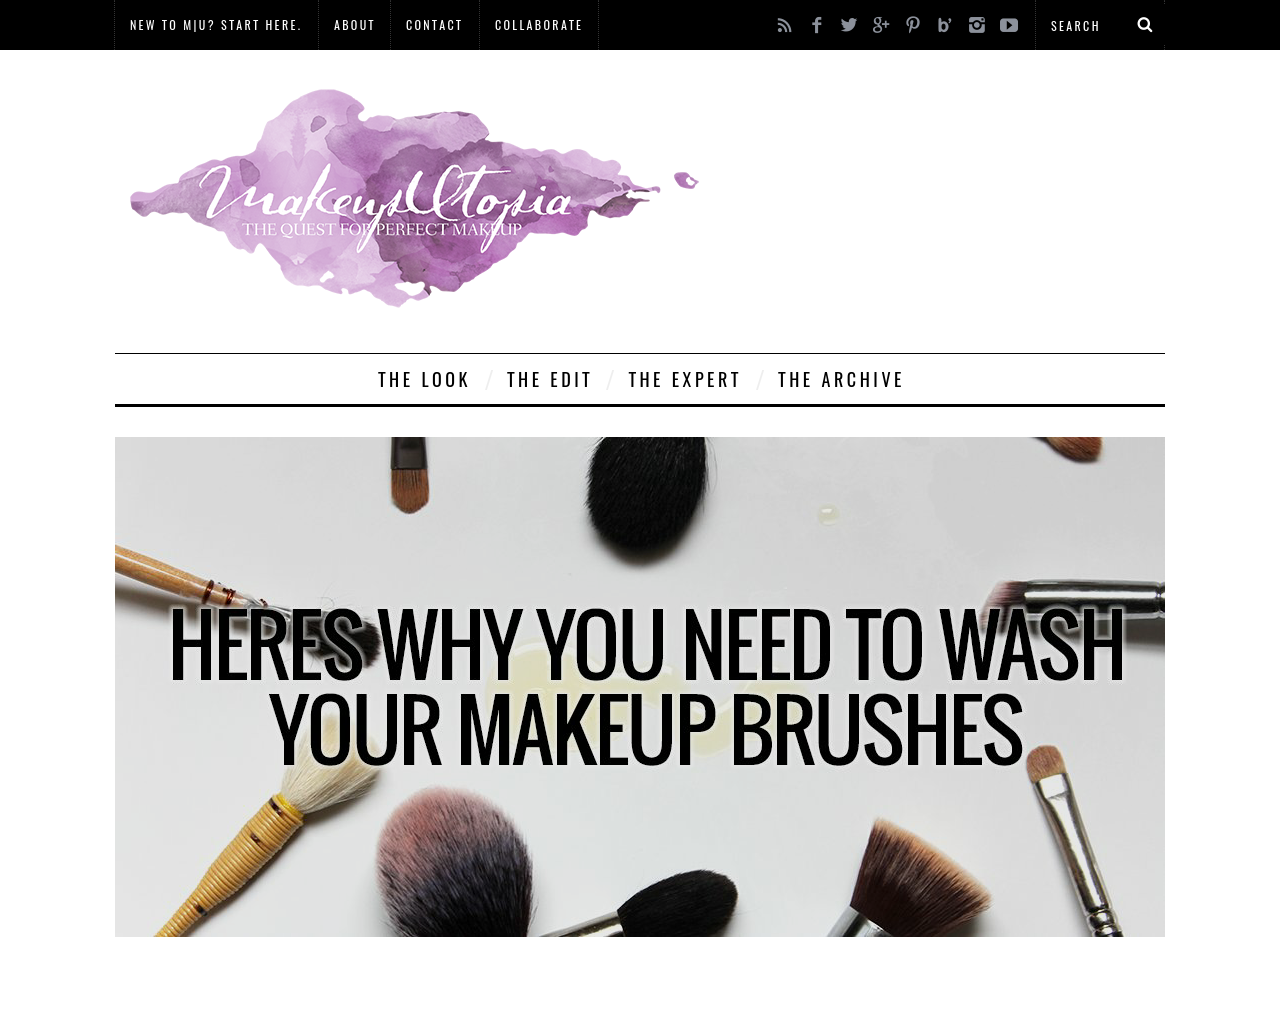 Makeup-Utopia-Advertising-Reviews-Pricing